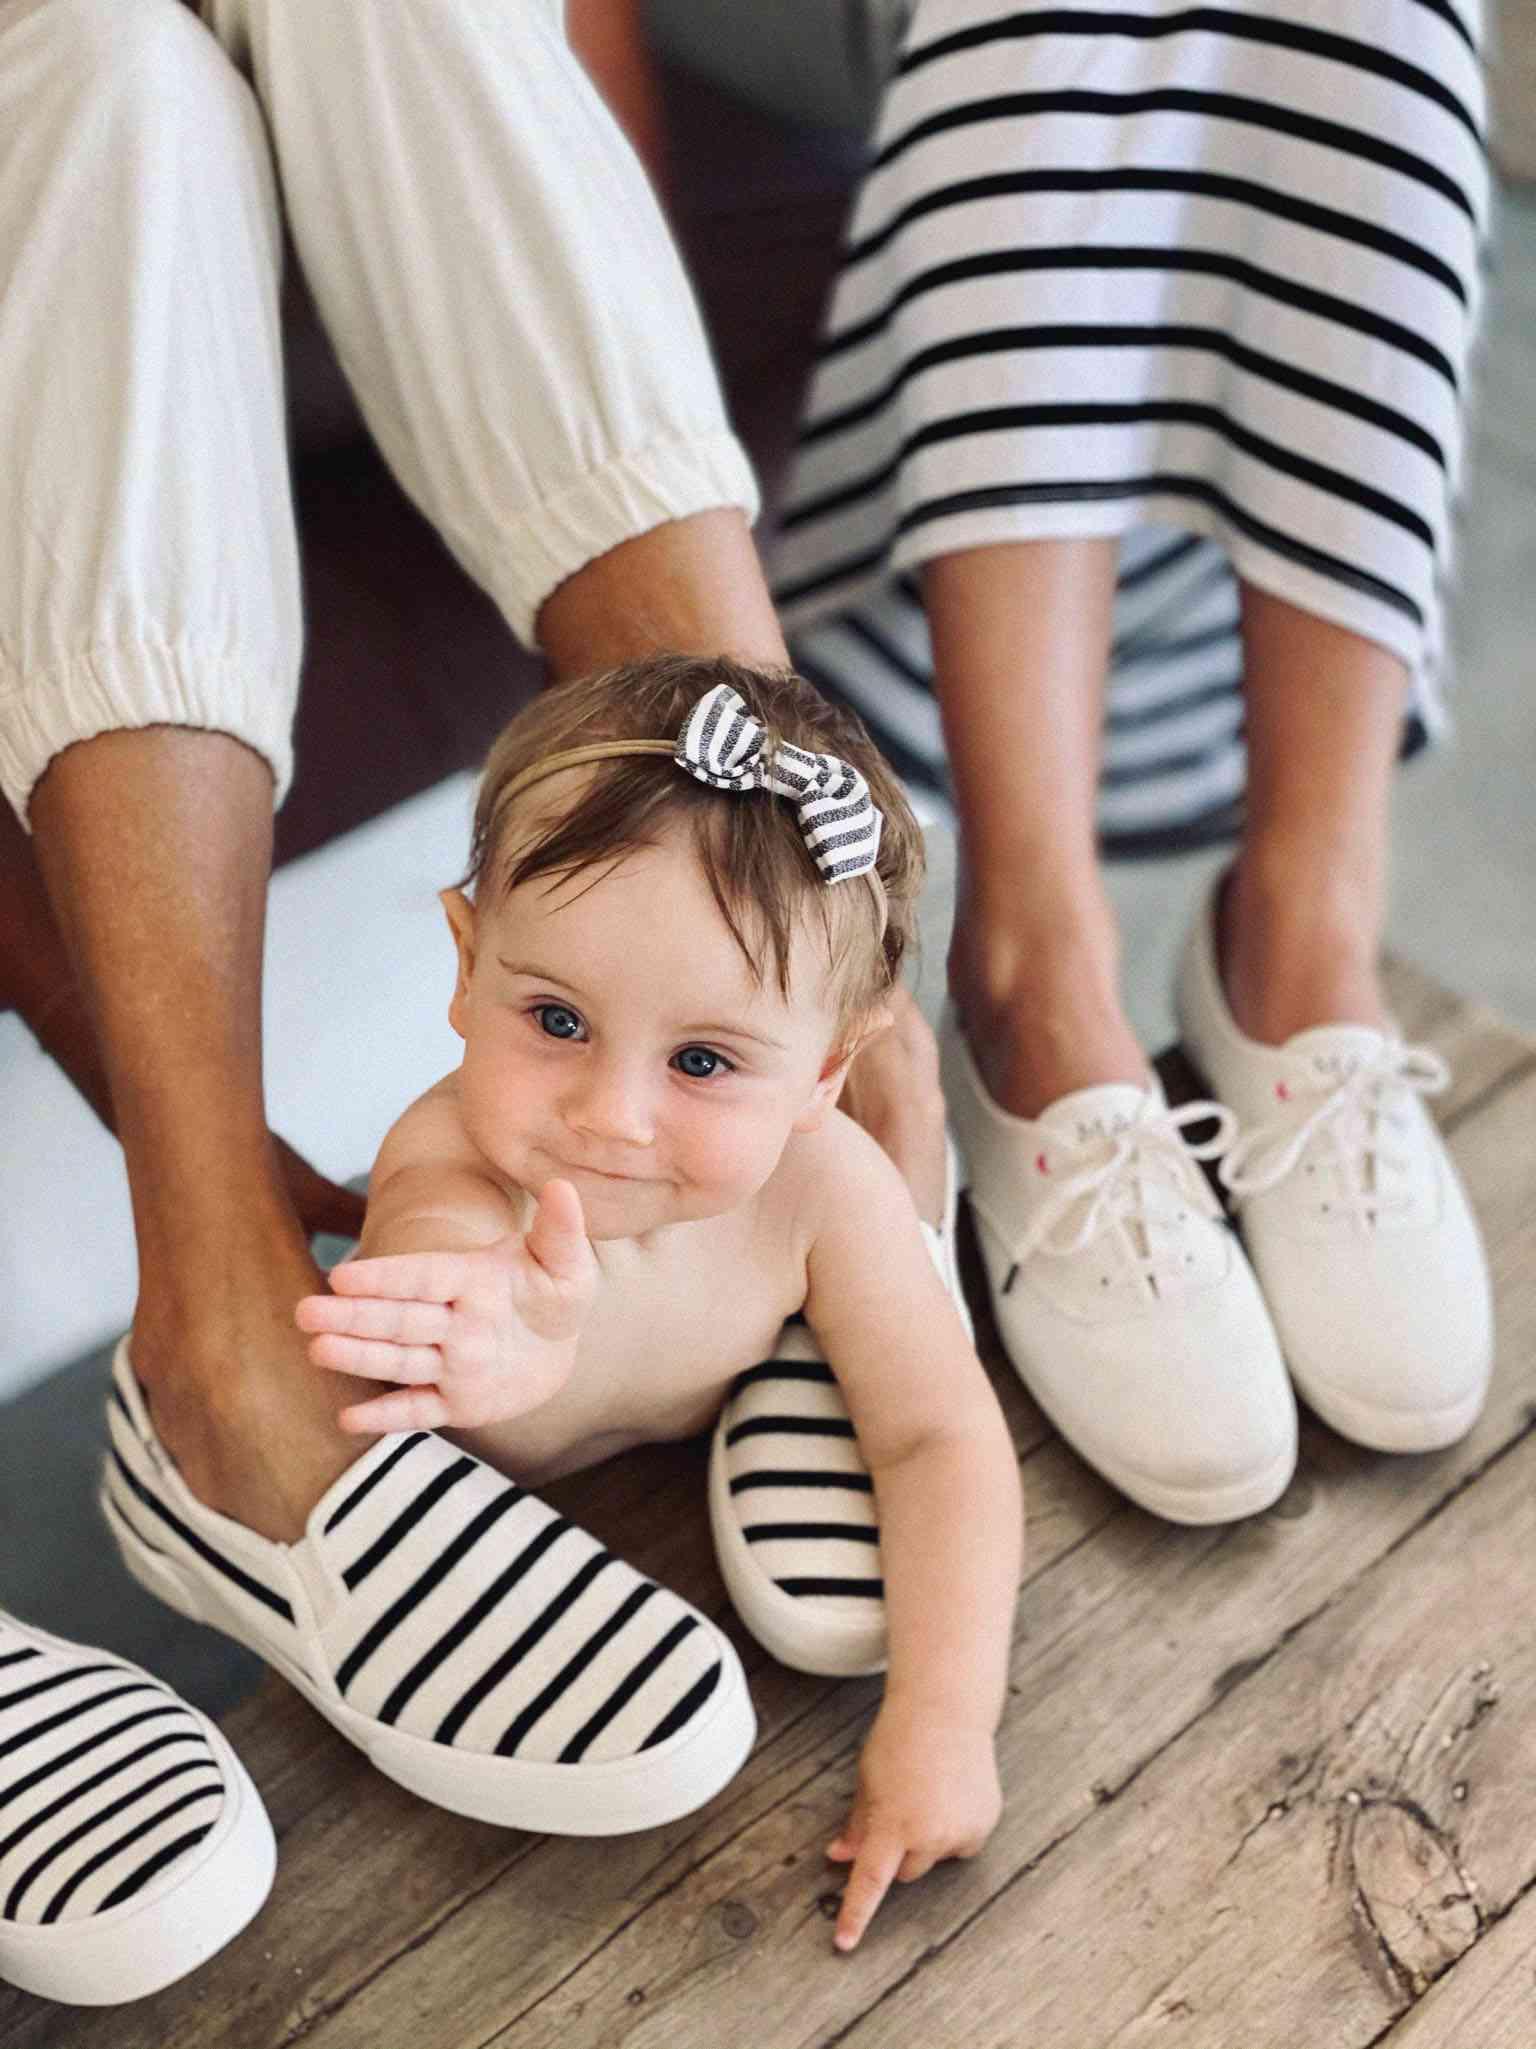 baby crawling between mother's legs